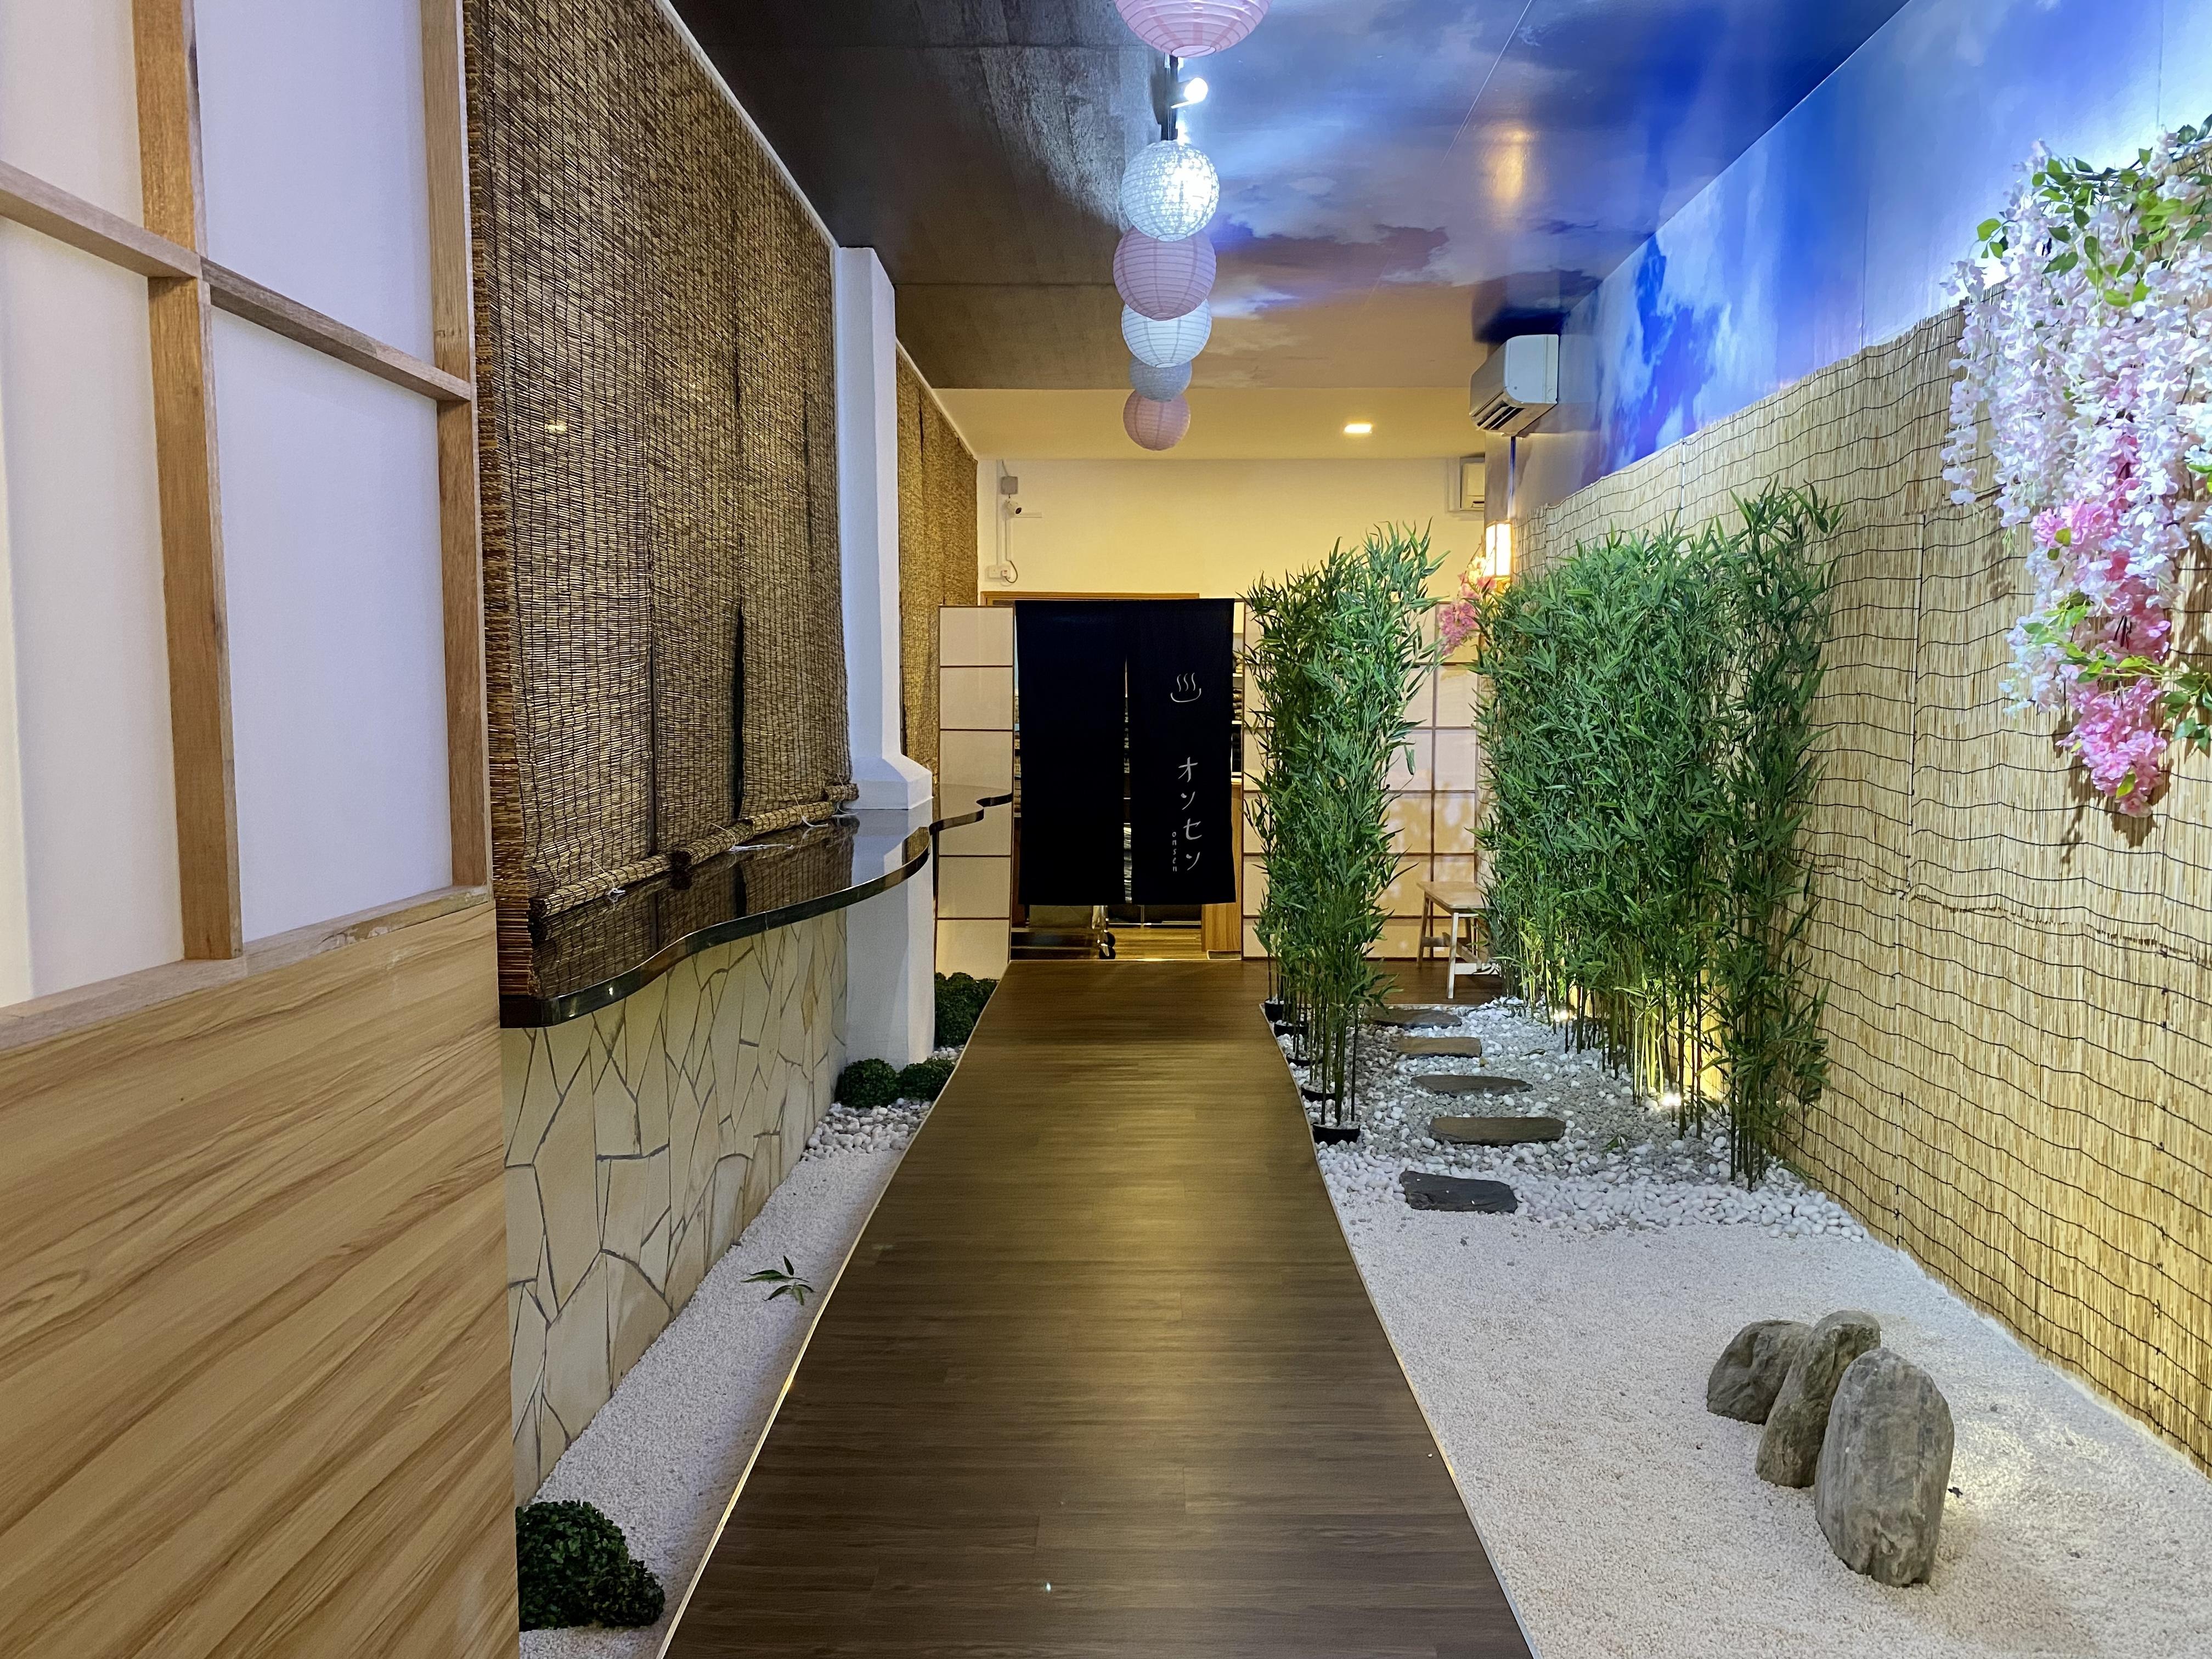 joya onsen entrance to onsen